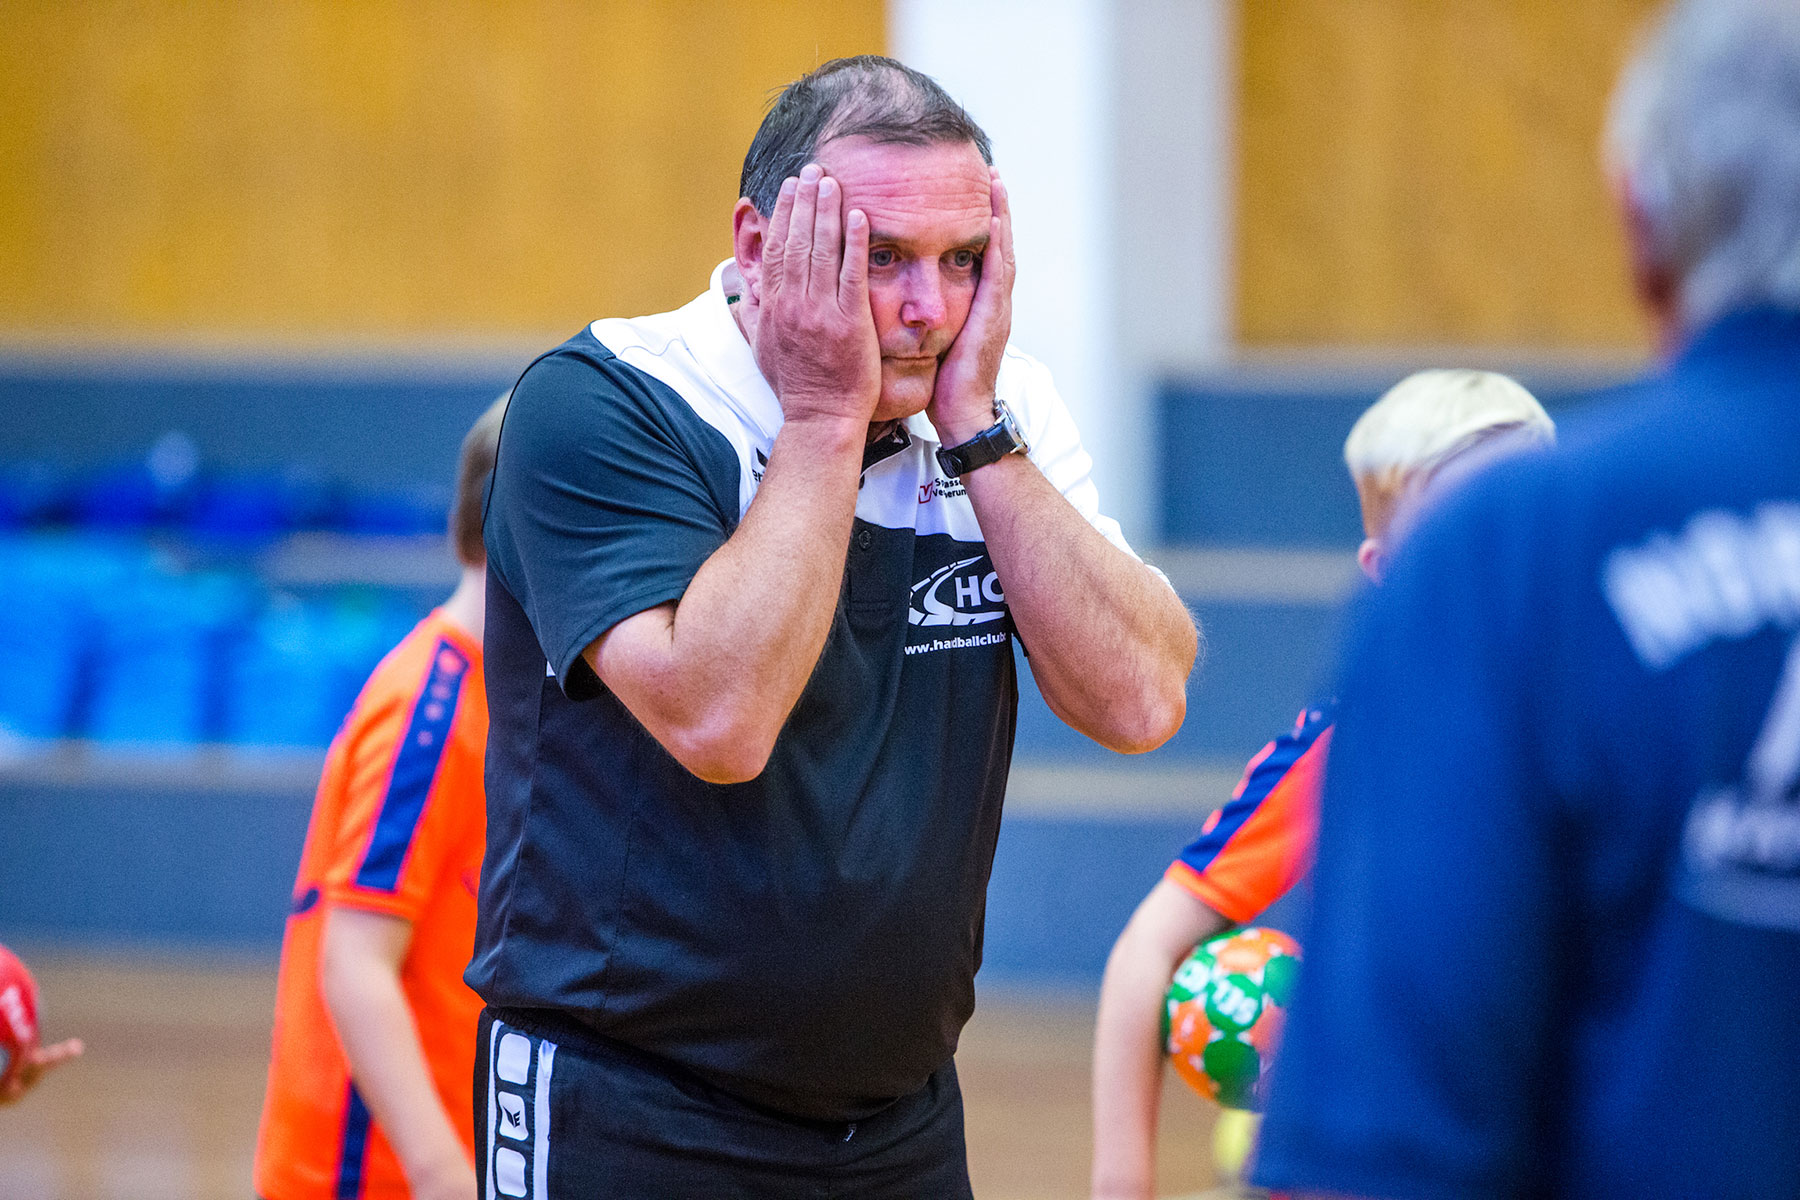 201809_Handballcamp_NDH (32)